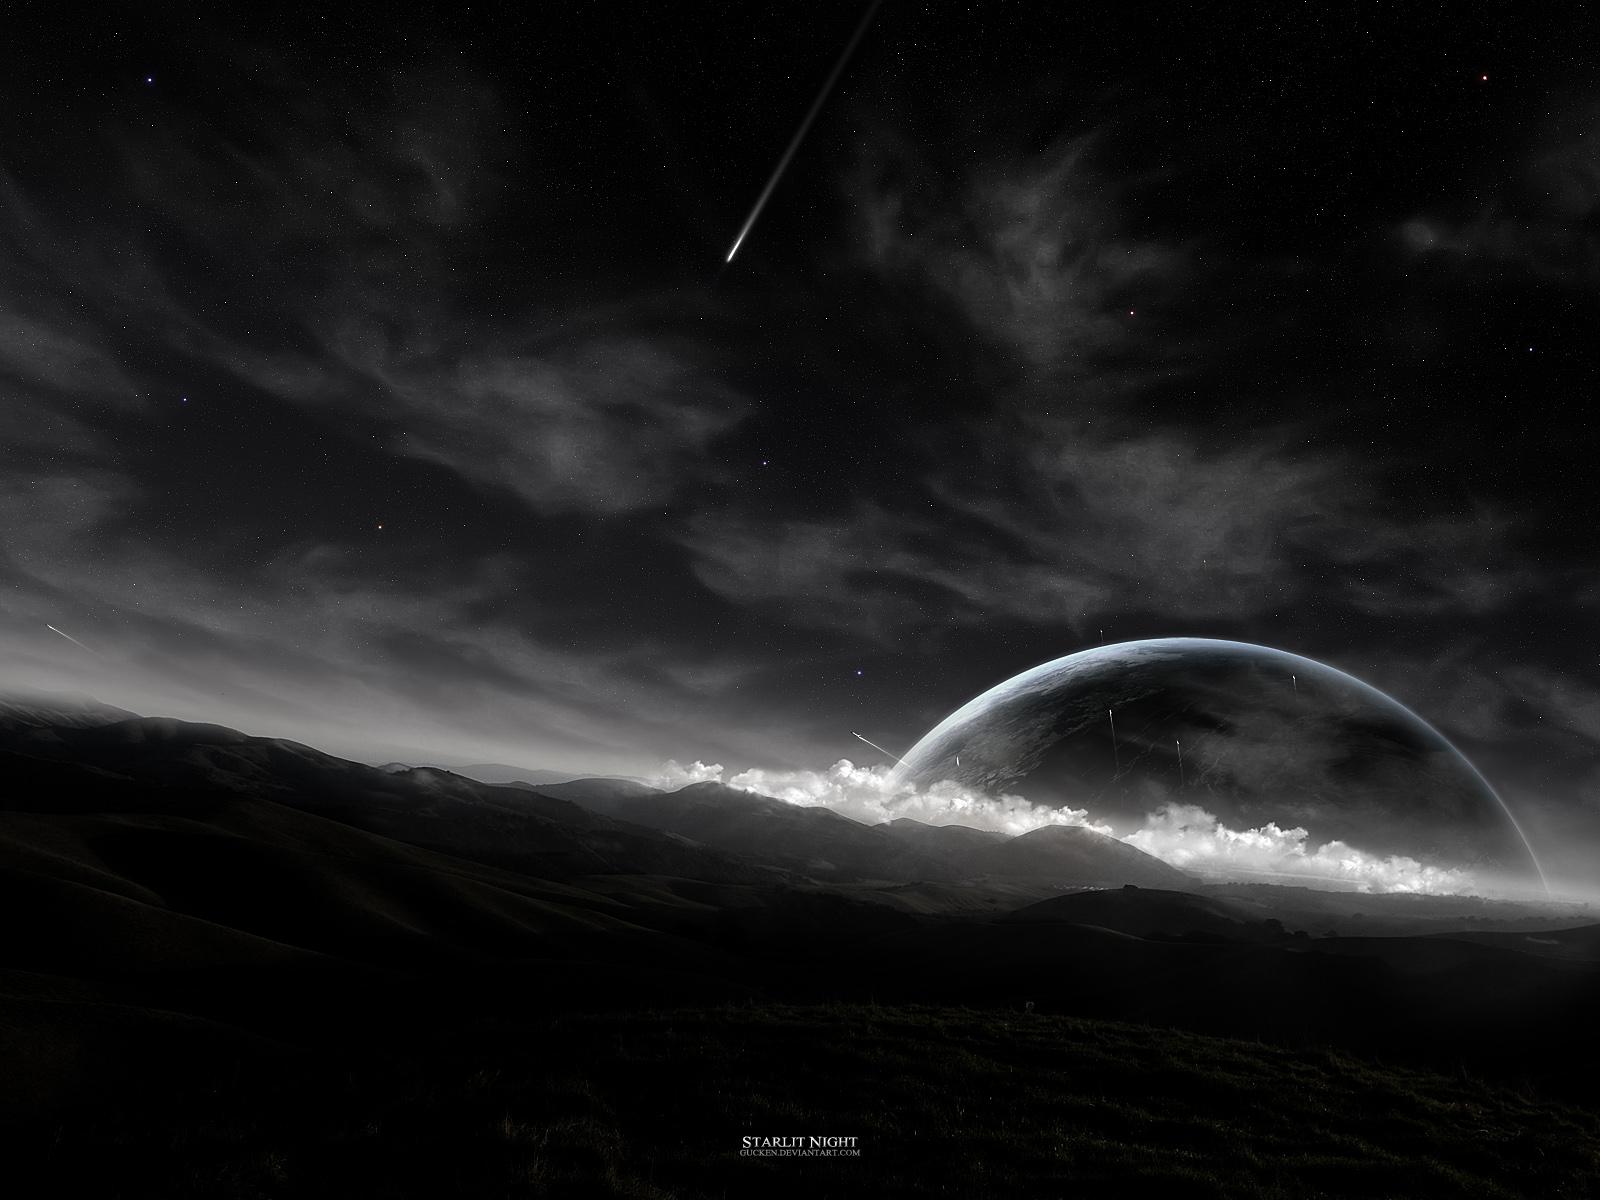 http://3.bp.blogspot.com/-mvYEOQHShEA/TcWj_ih1V3I/AAAAAAAAAWs/RFitbIq-wPI/s1600/139fa_Starlit_Night_by_gucken.jpg